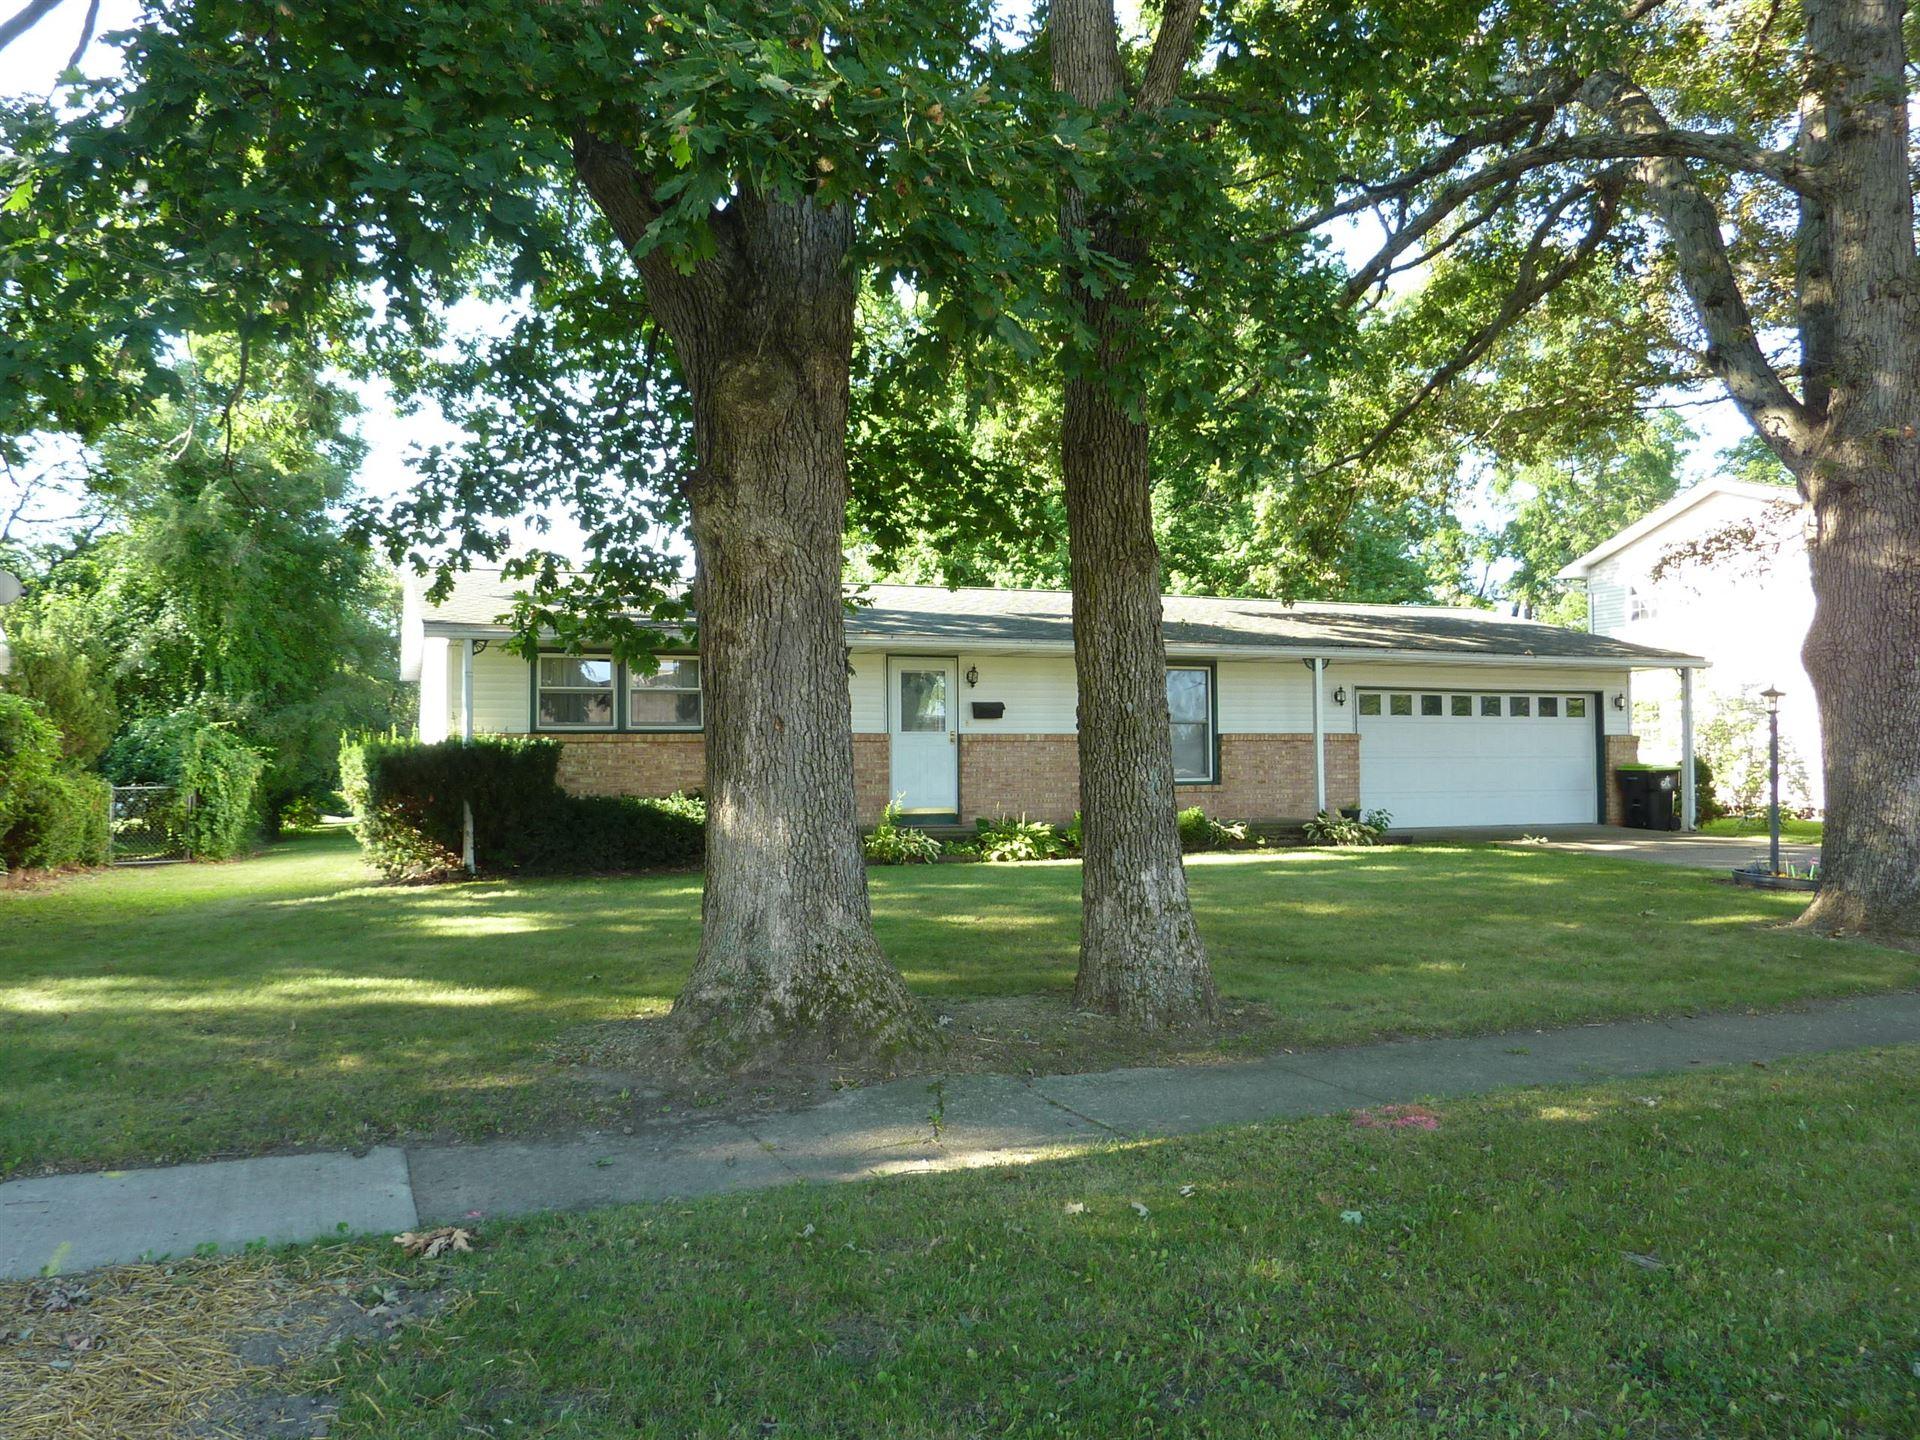 615 E Judd Street, Greenville, MI 48838 - MLS#: 21103596